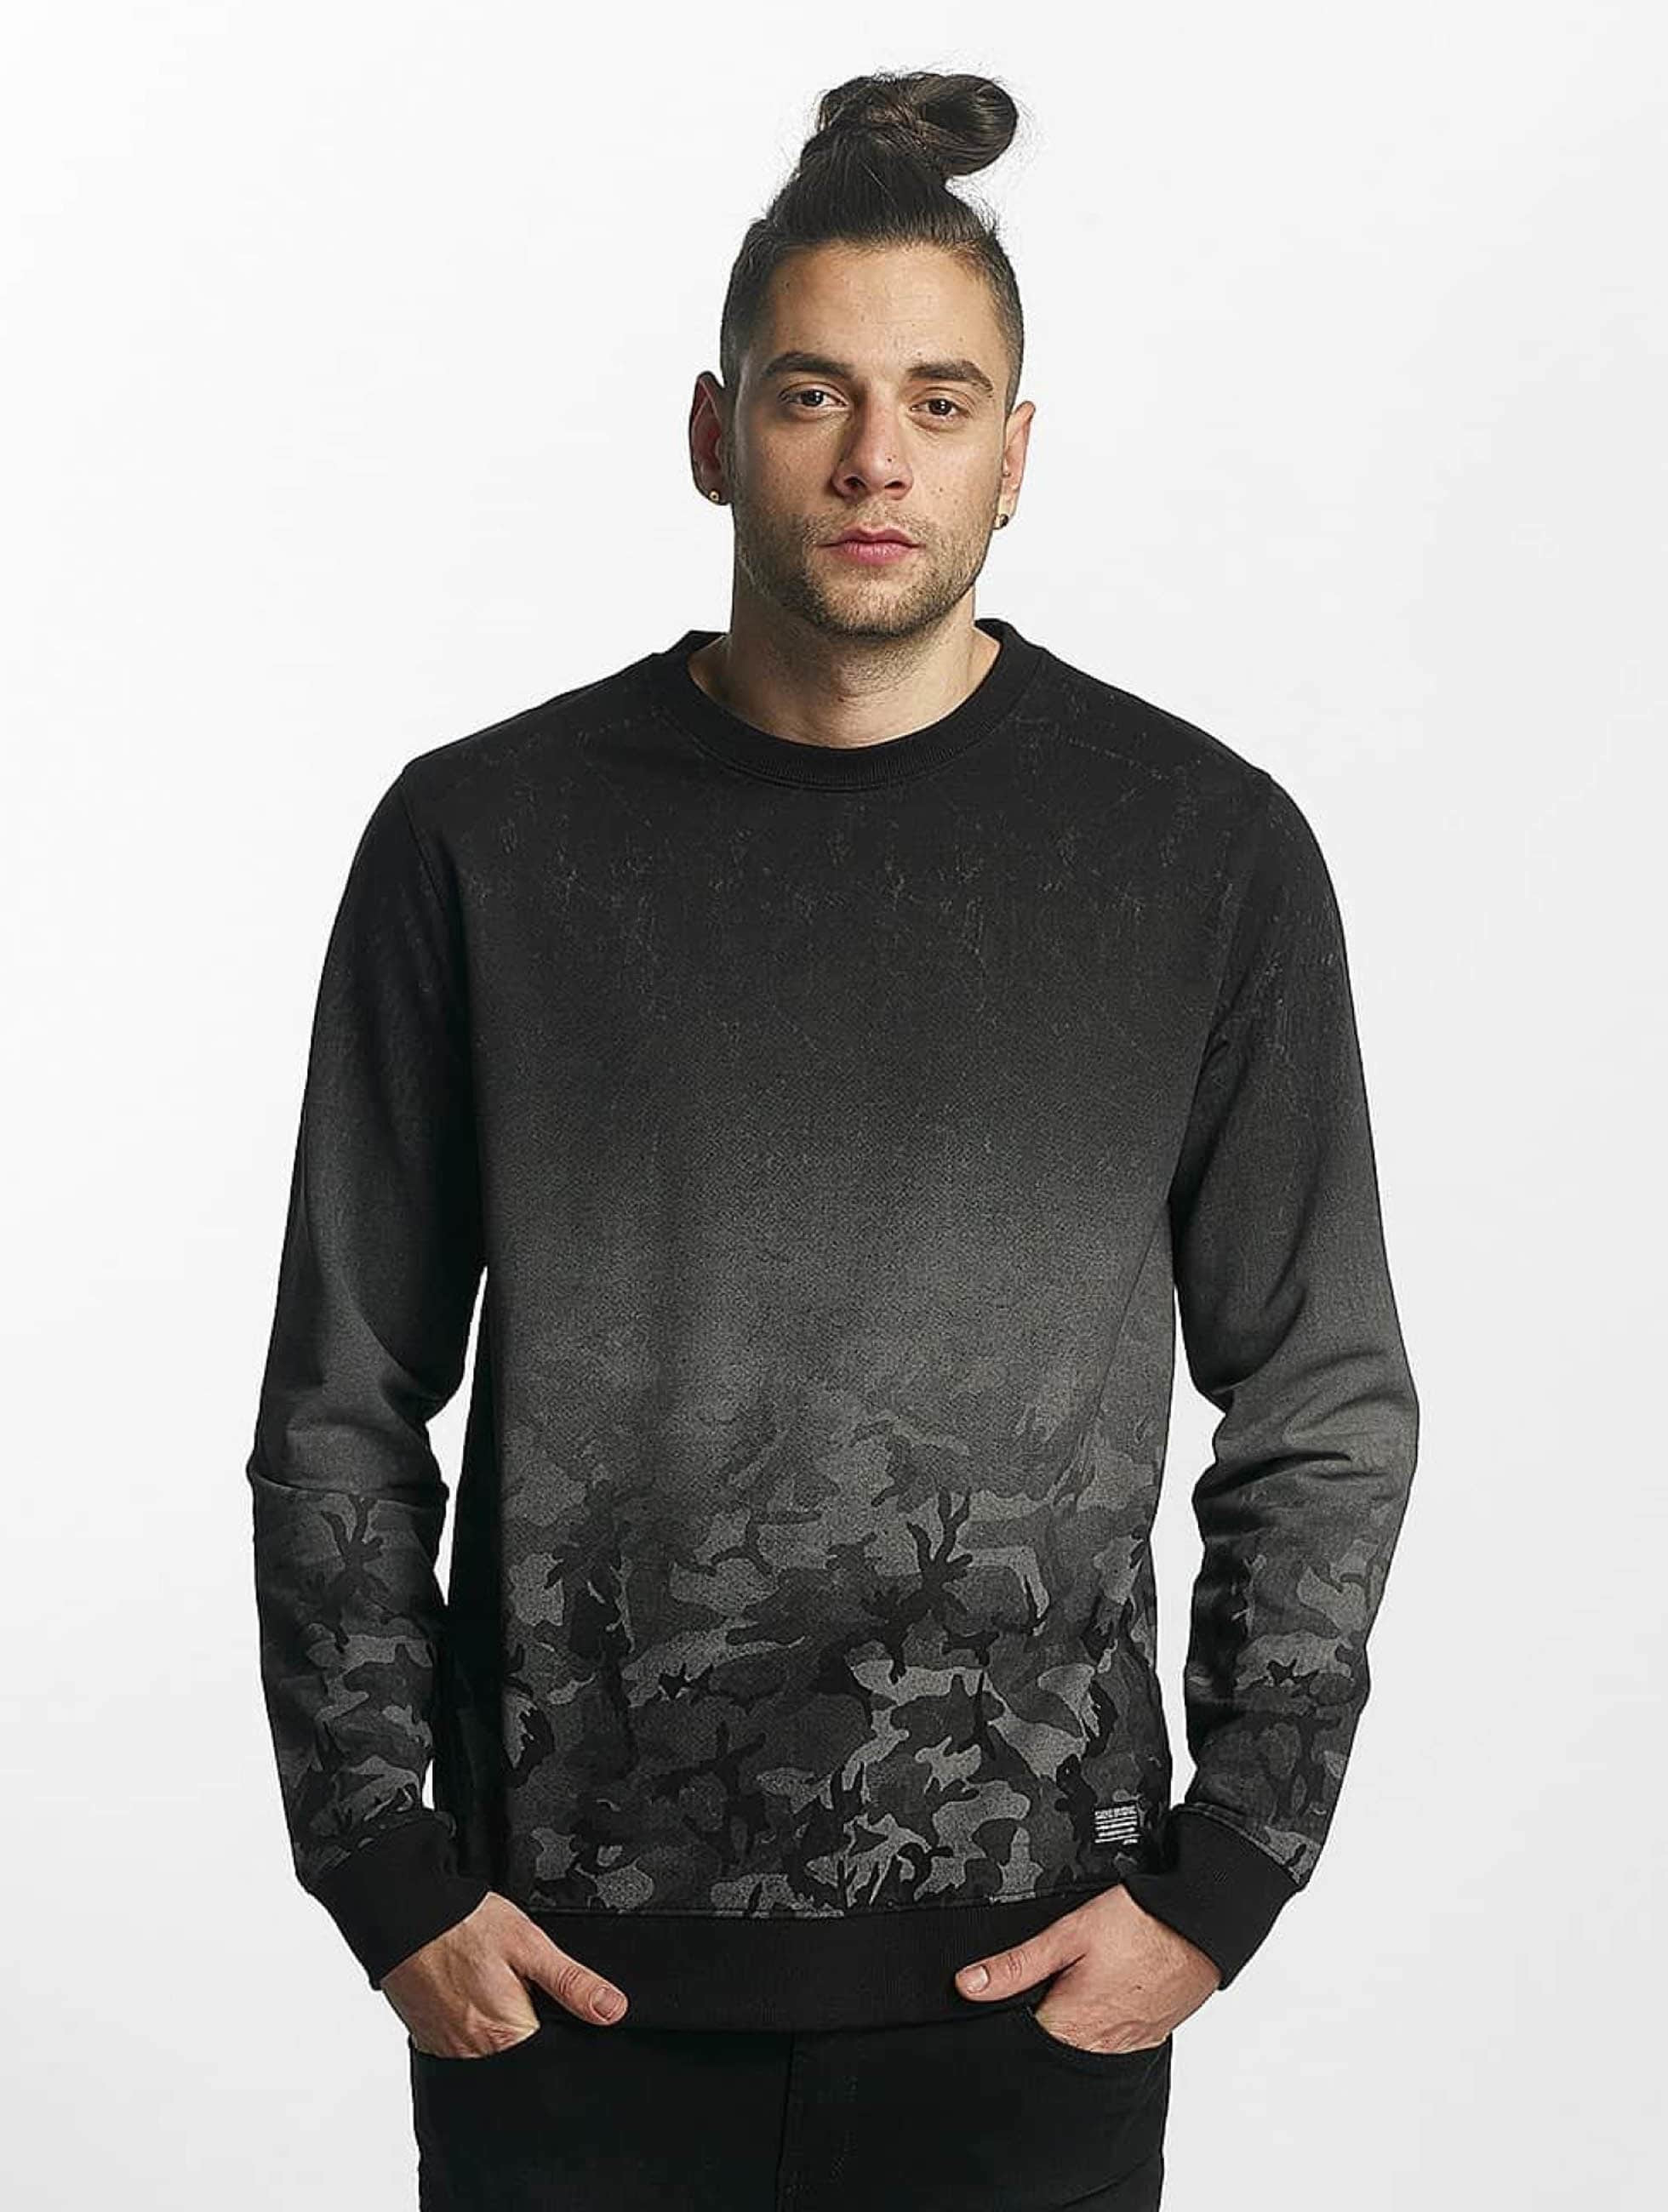 8c8f43185db18 SHINE Original   Original Grady noir Homme Sweat   Pull SHINE Original acheter  pas cher Haut 392533